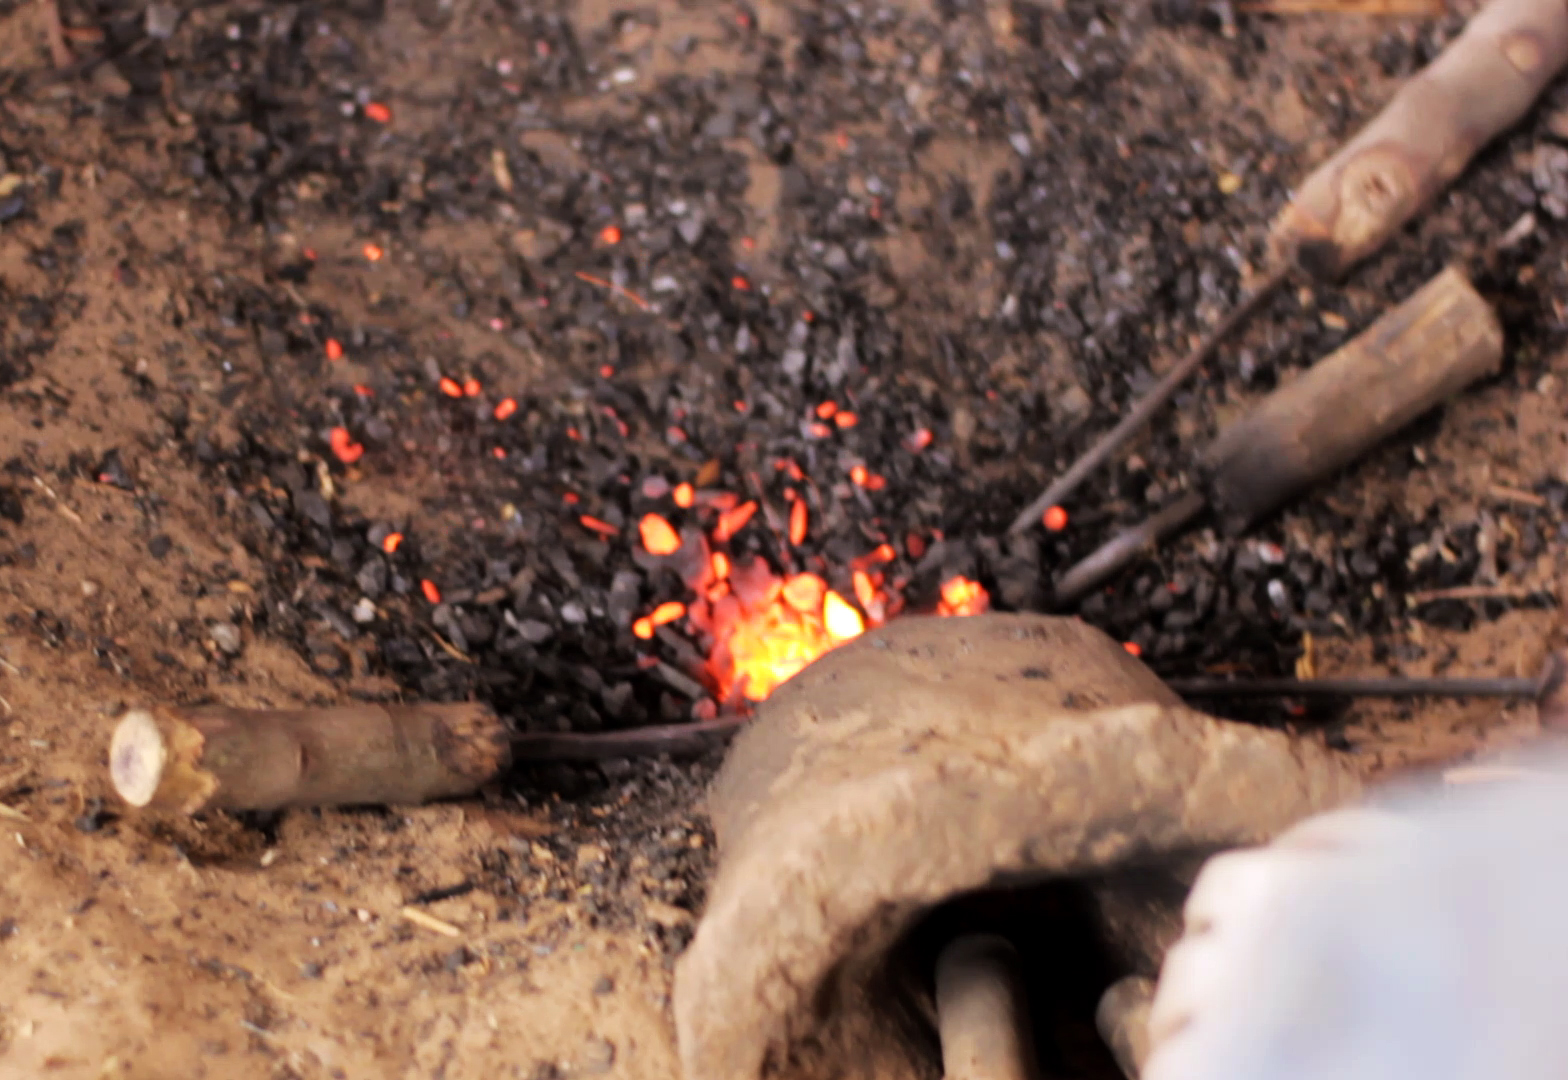 pablocaminante bandido dogon herrero mali - Malí 8, País Dogon V: moda, arte y religión